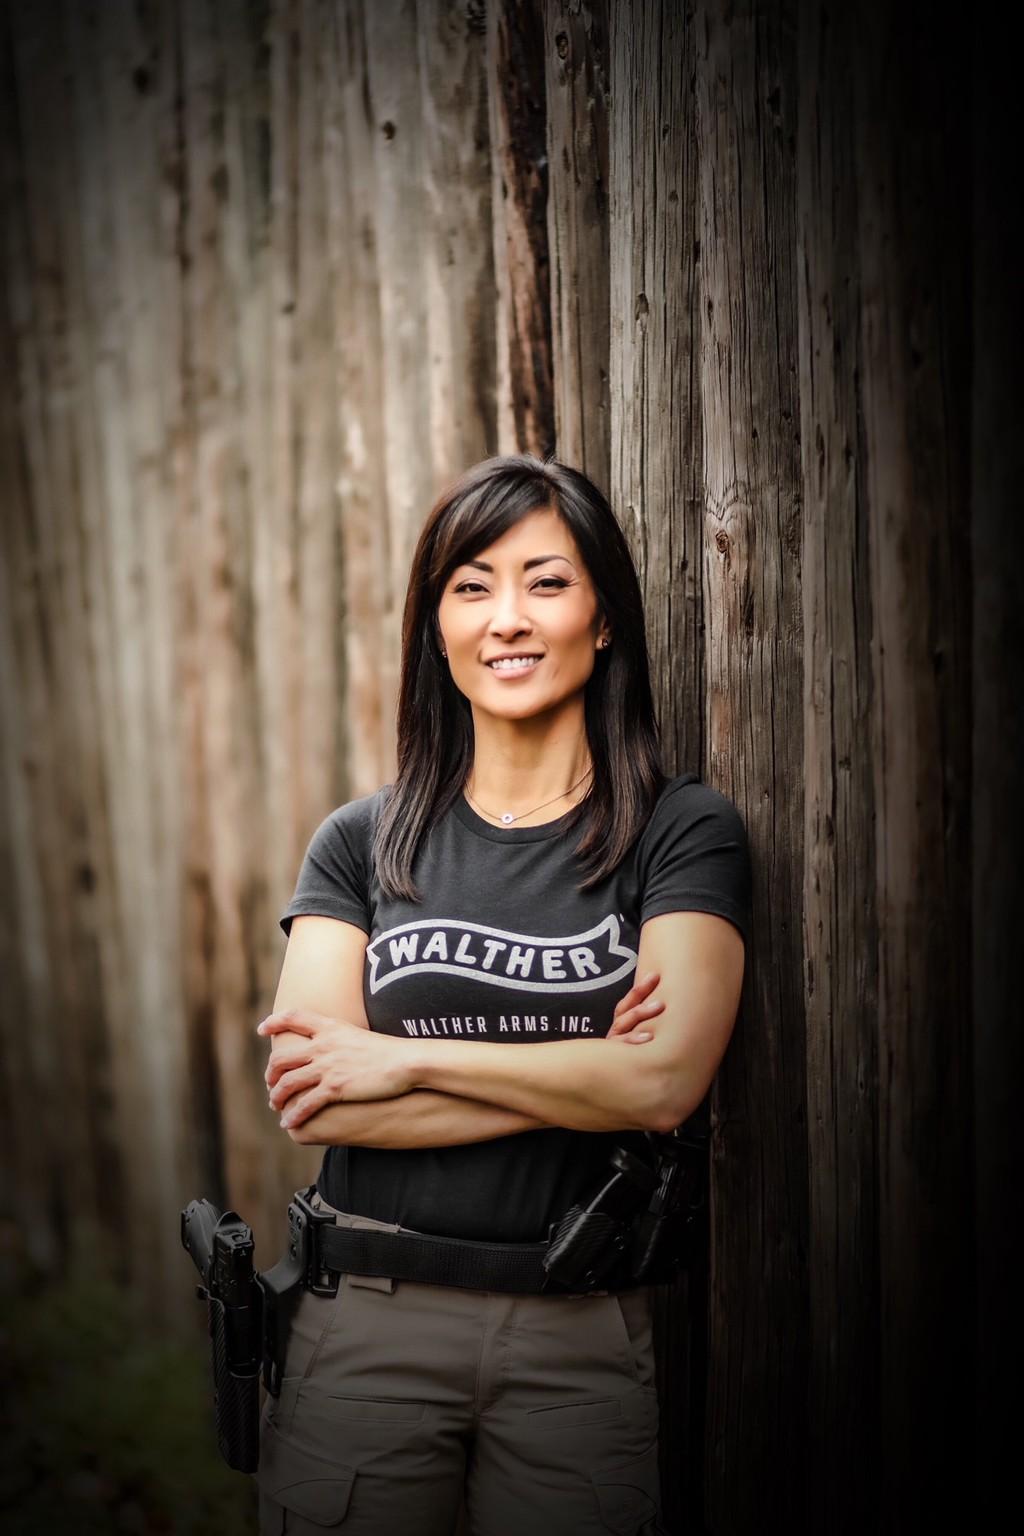 Michelle Waldran - XS Ambassador